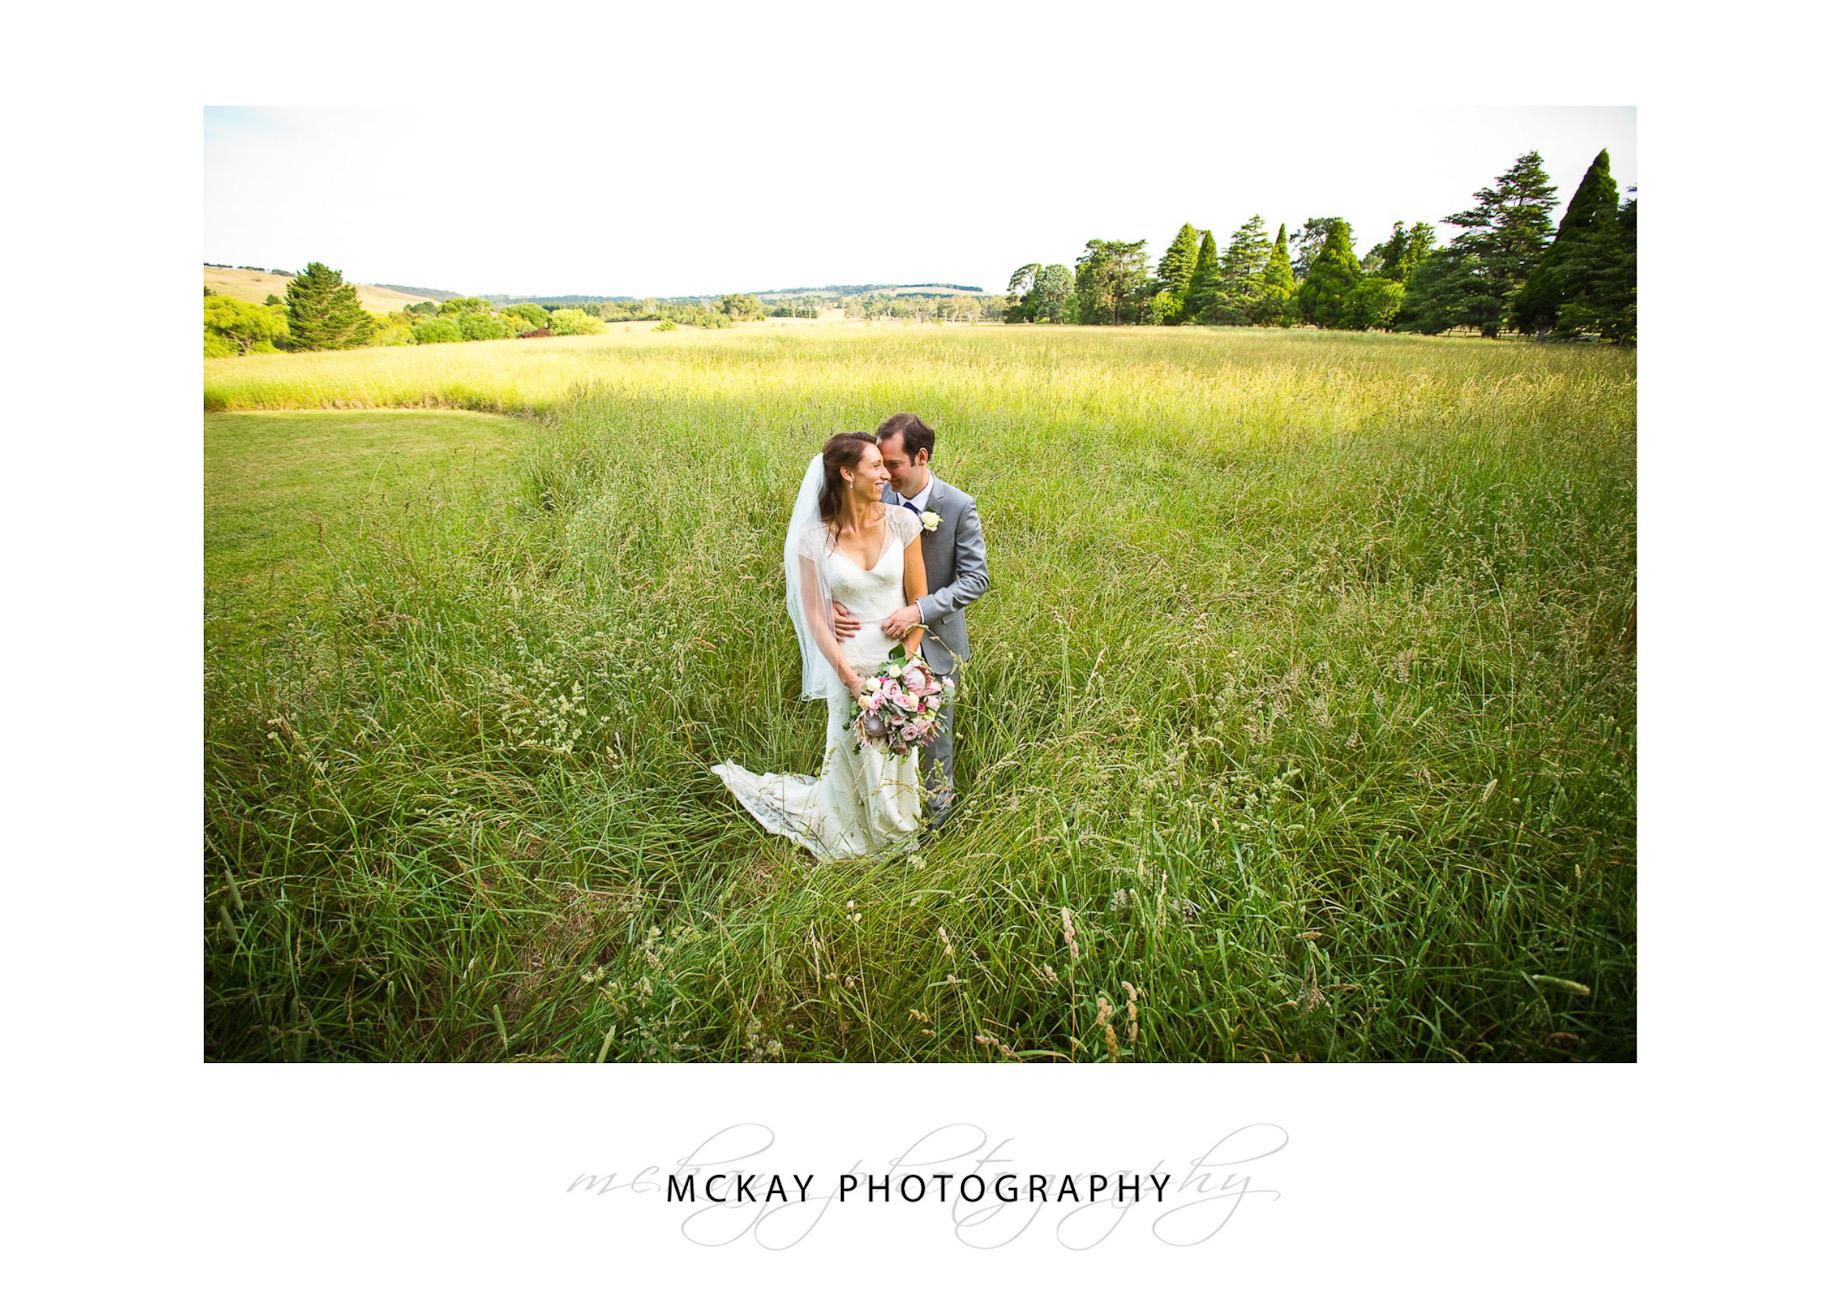 Grass field wide shot wedding photo